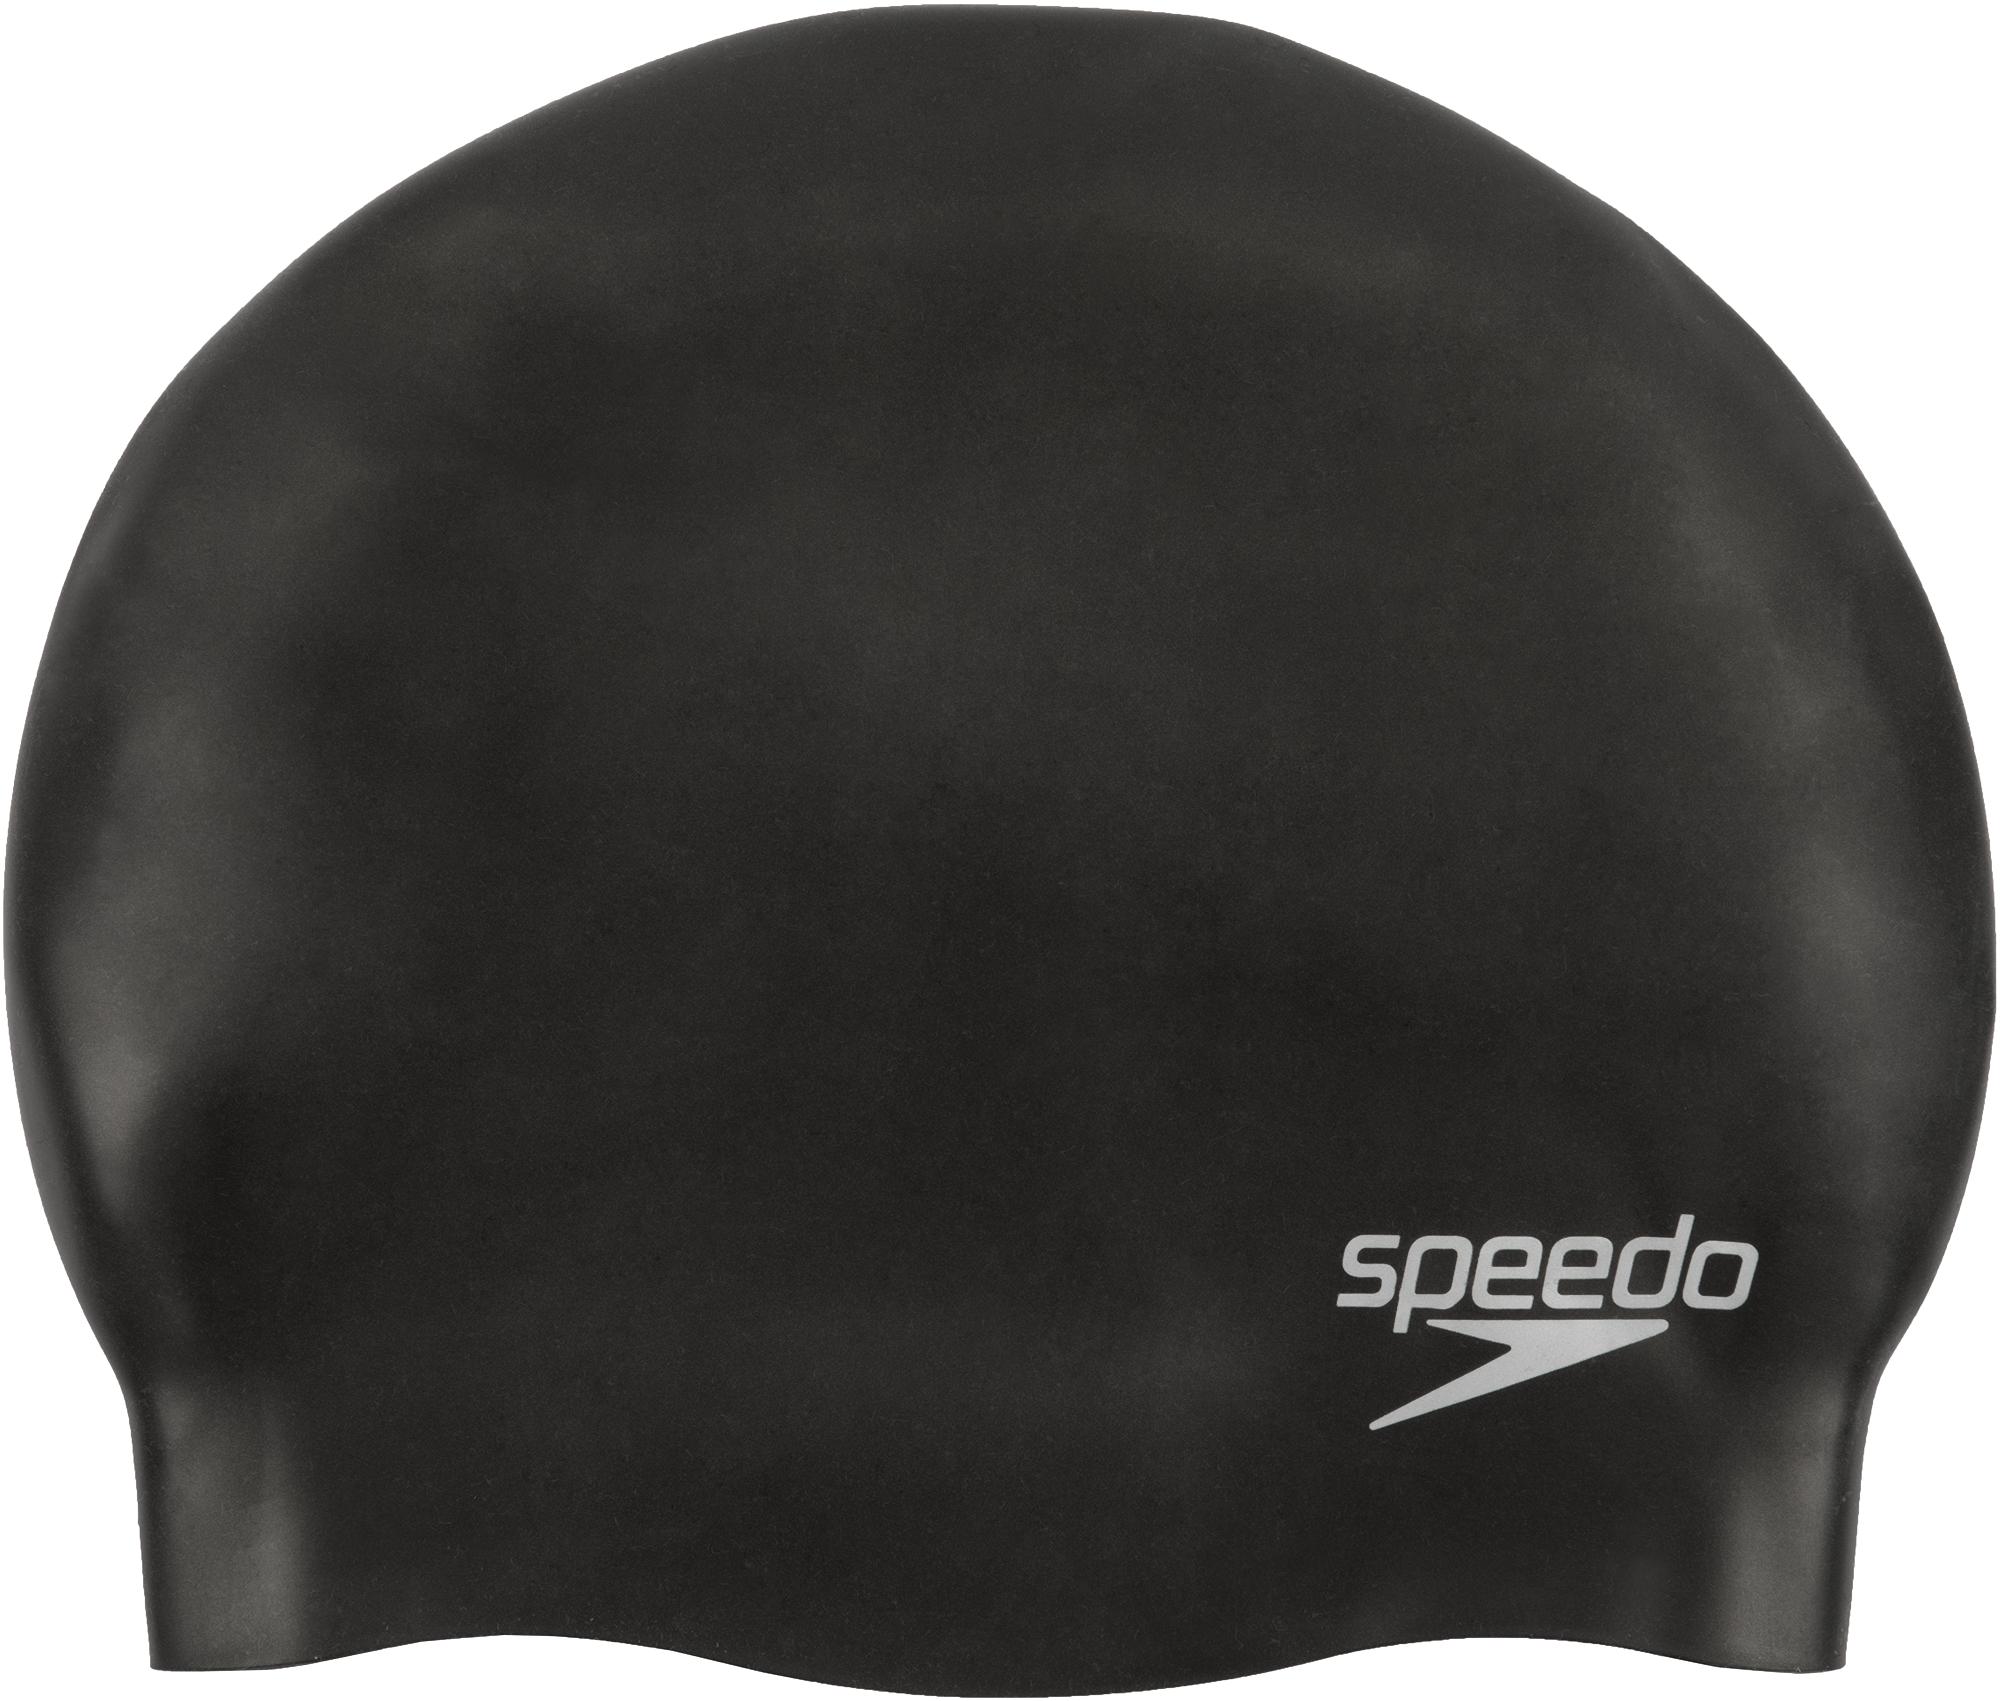 Speedo Шапочка для плавания детская Speedo Plain Moulded Silicone, размер Без размера все цены